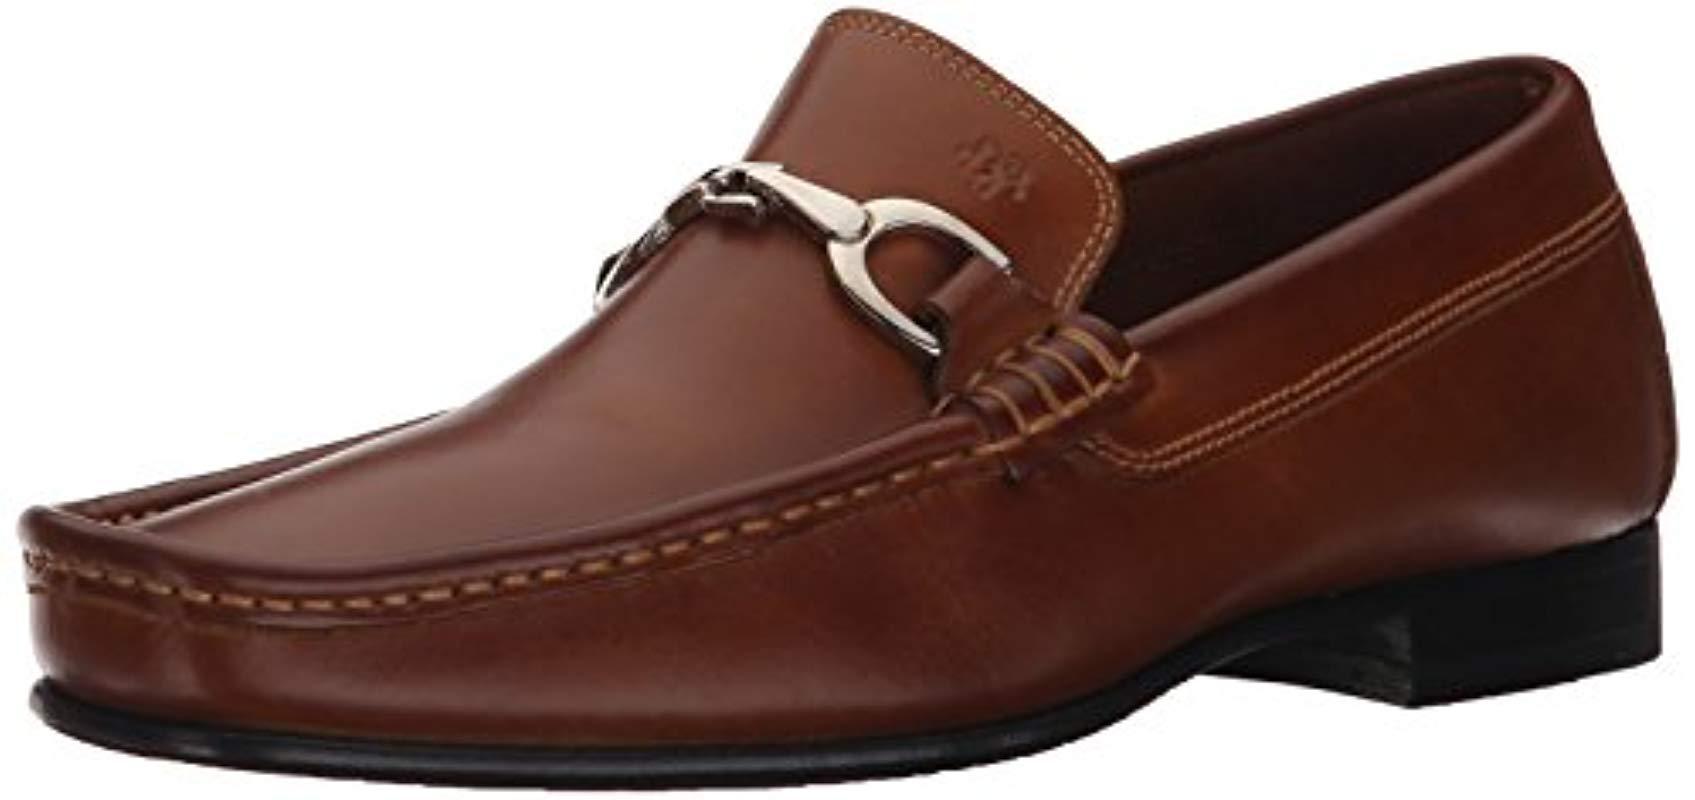 63845b7ded1 Lyst - Donald J Pliner Darrin (saddle 2) Men s Slip On Shoes in ...